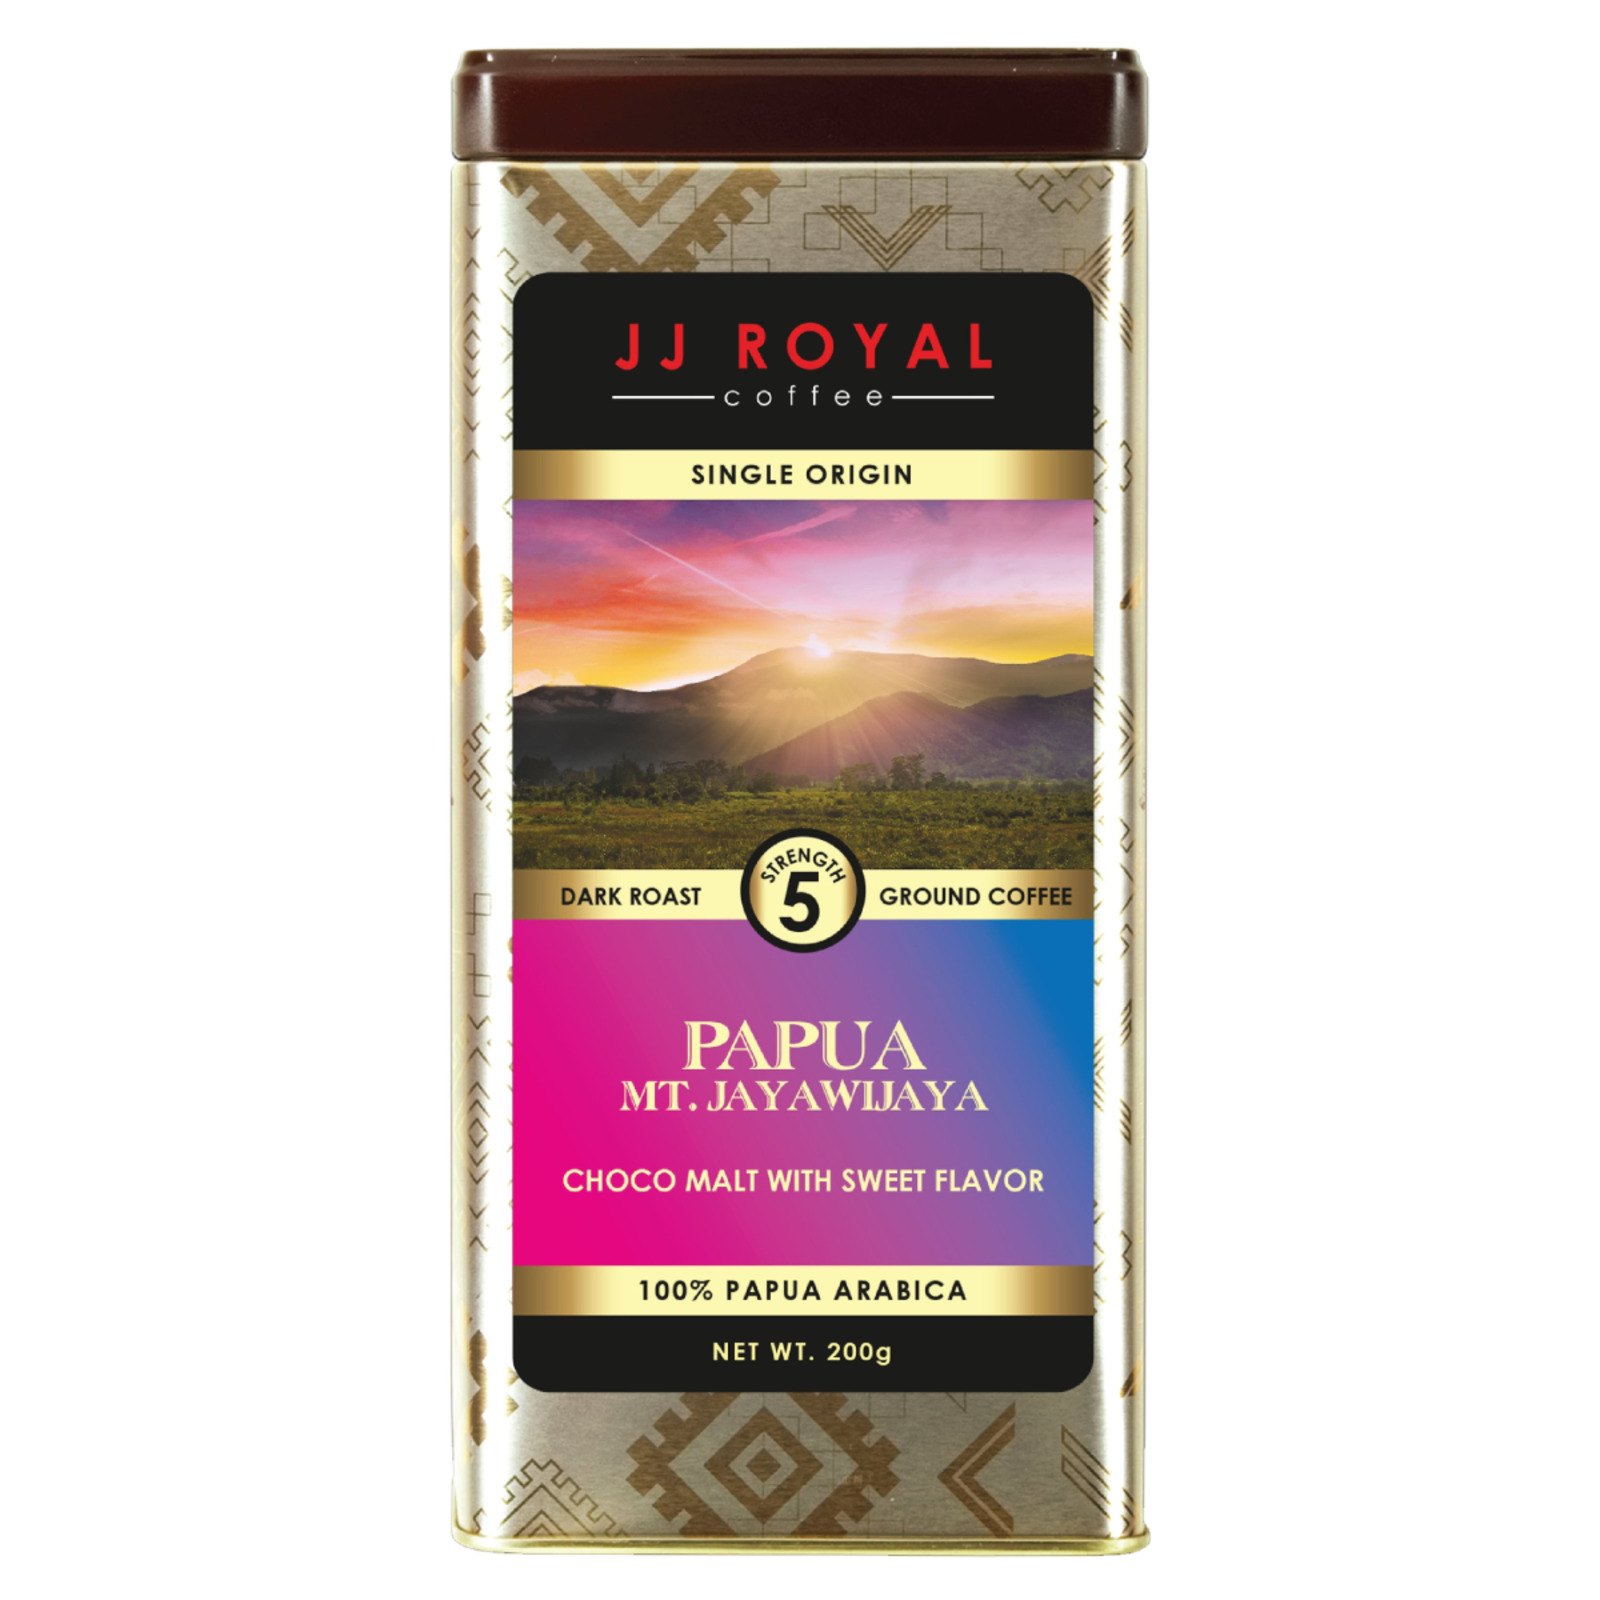 JJ Royal Coffee - Papua 100% Arabica (Ground)